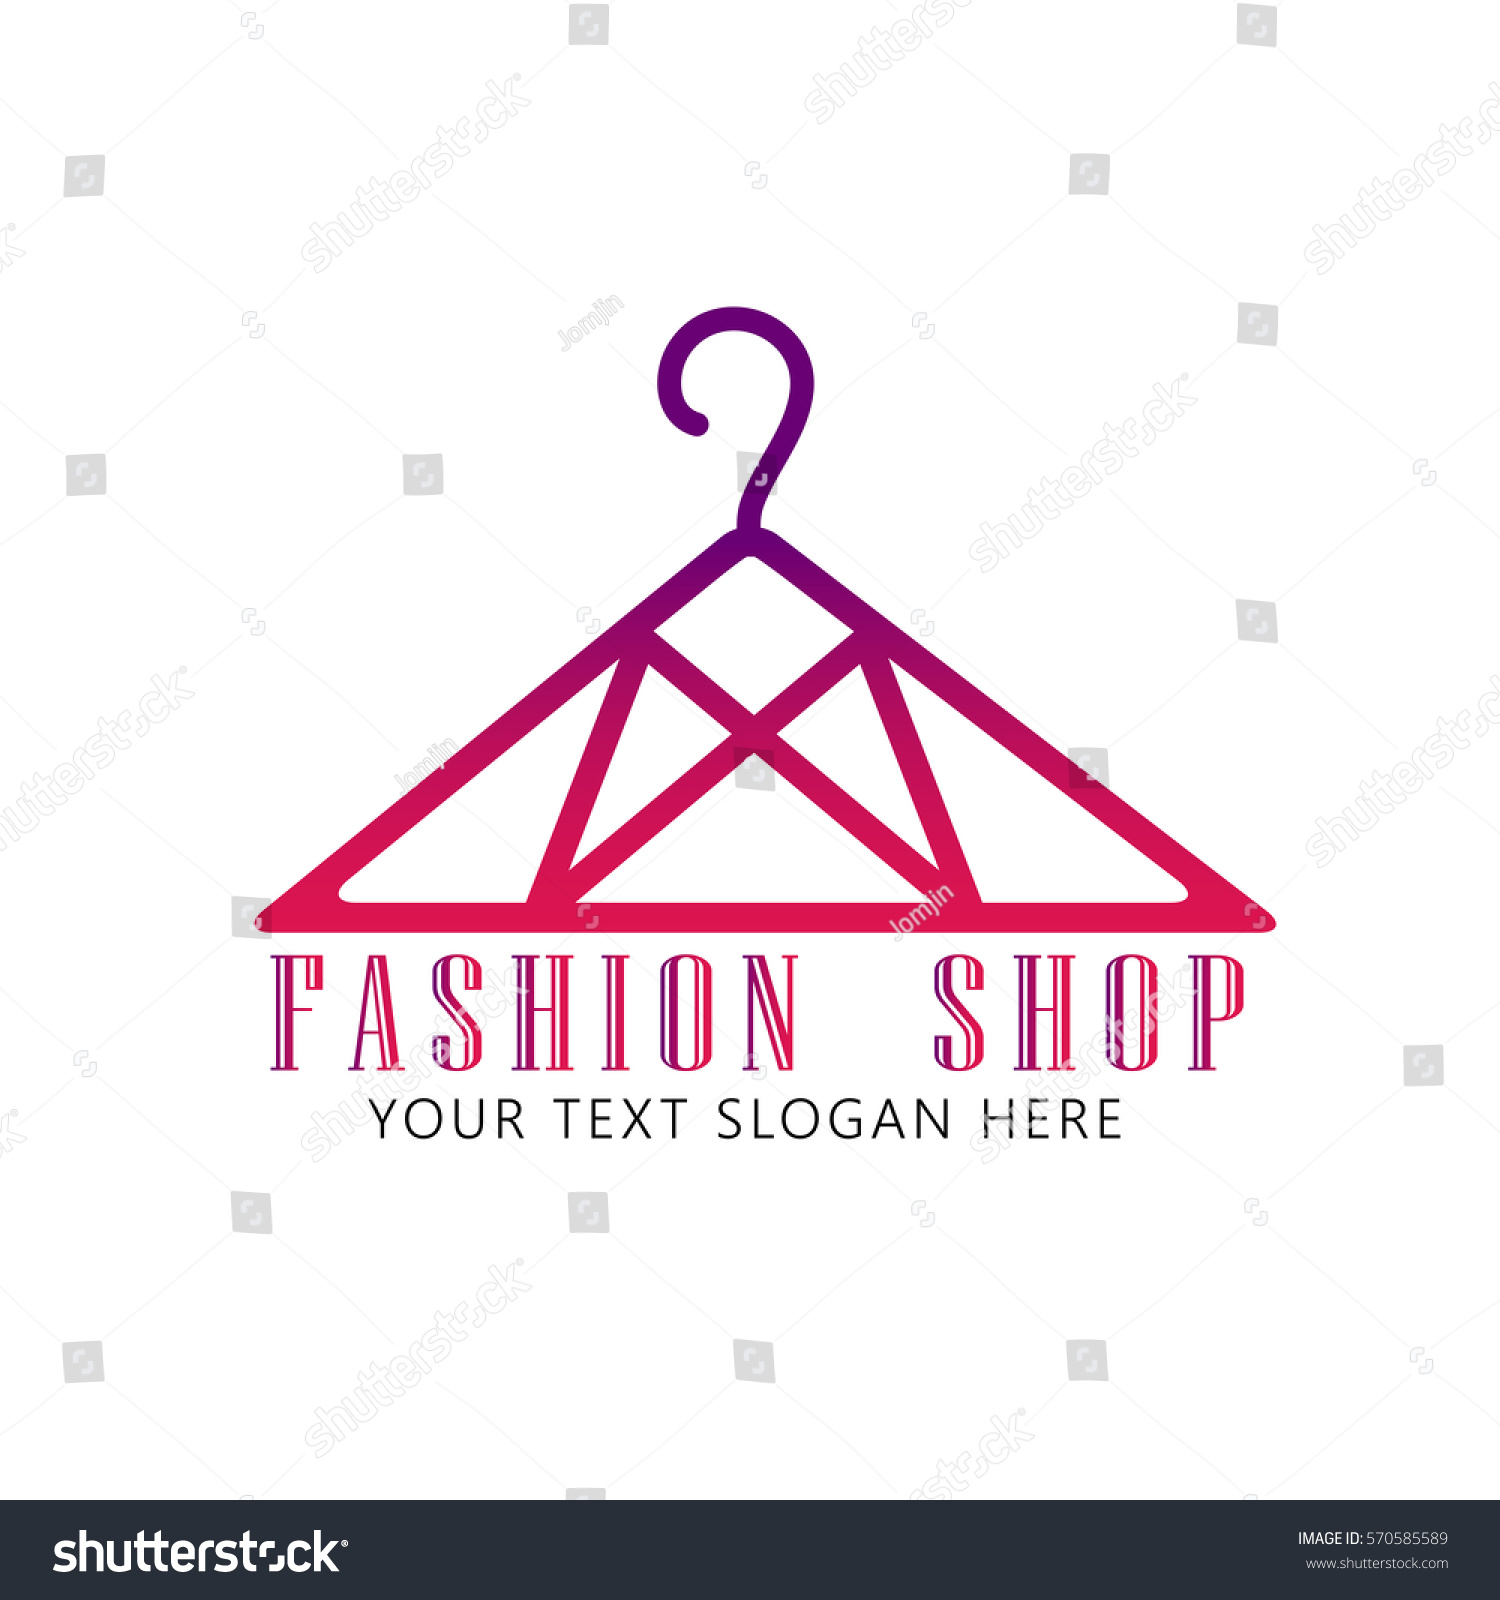 Fashion shop logo pink clothes hanger stock vector 570585589 fashion shop logo pink clothes hanger logo design vector buycottarizona